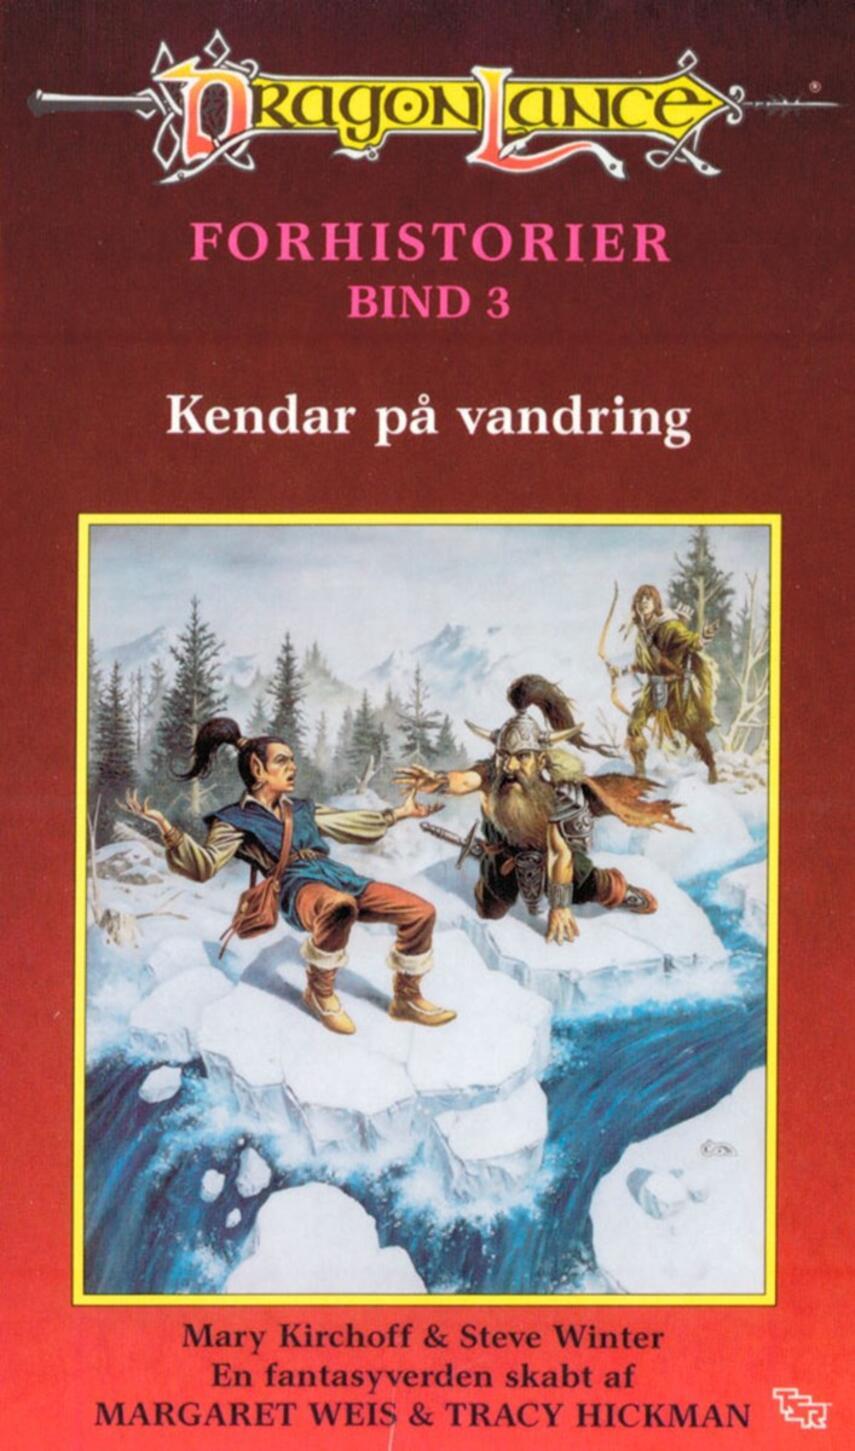 Mary Kirchoff, Steve Winter: Kendar på vandring